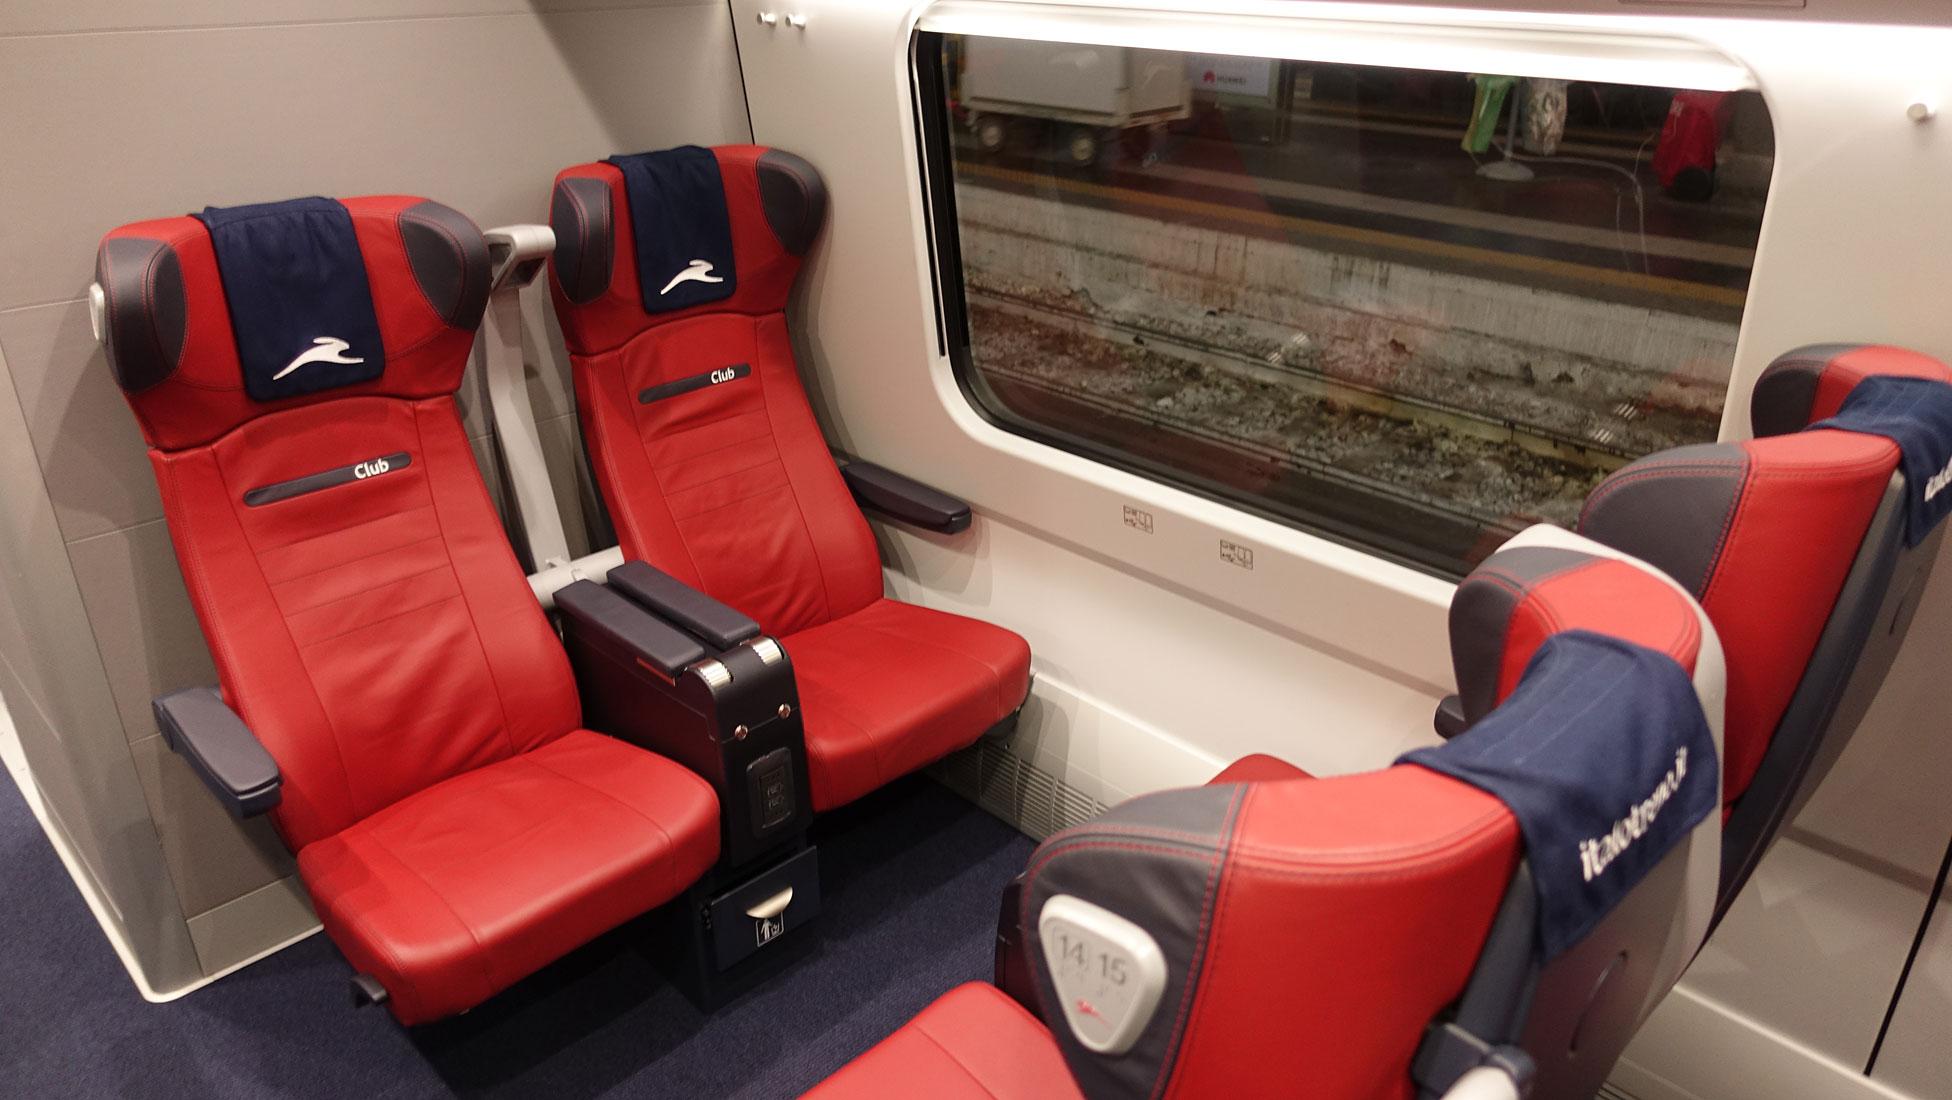 Awe Inspiring Italo Trains Italo Tickets From 15 Beatyapartments Chair Design Images Beatyapartmentscom